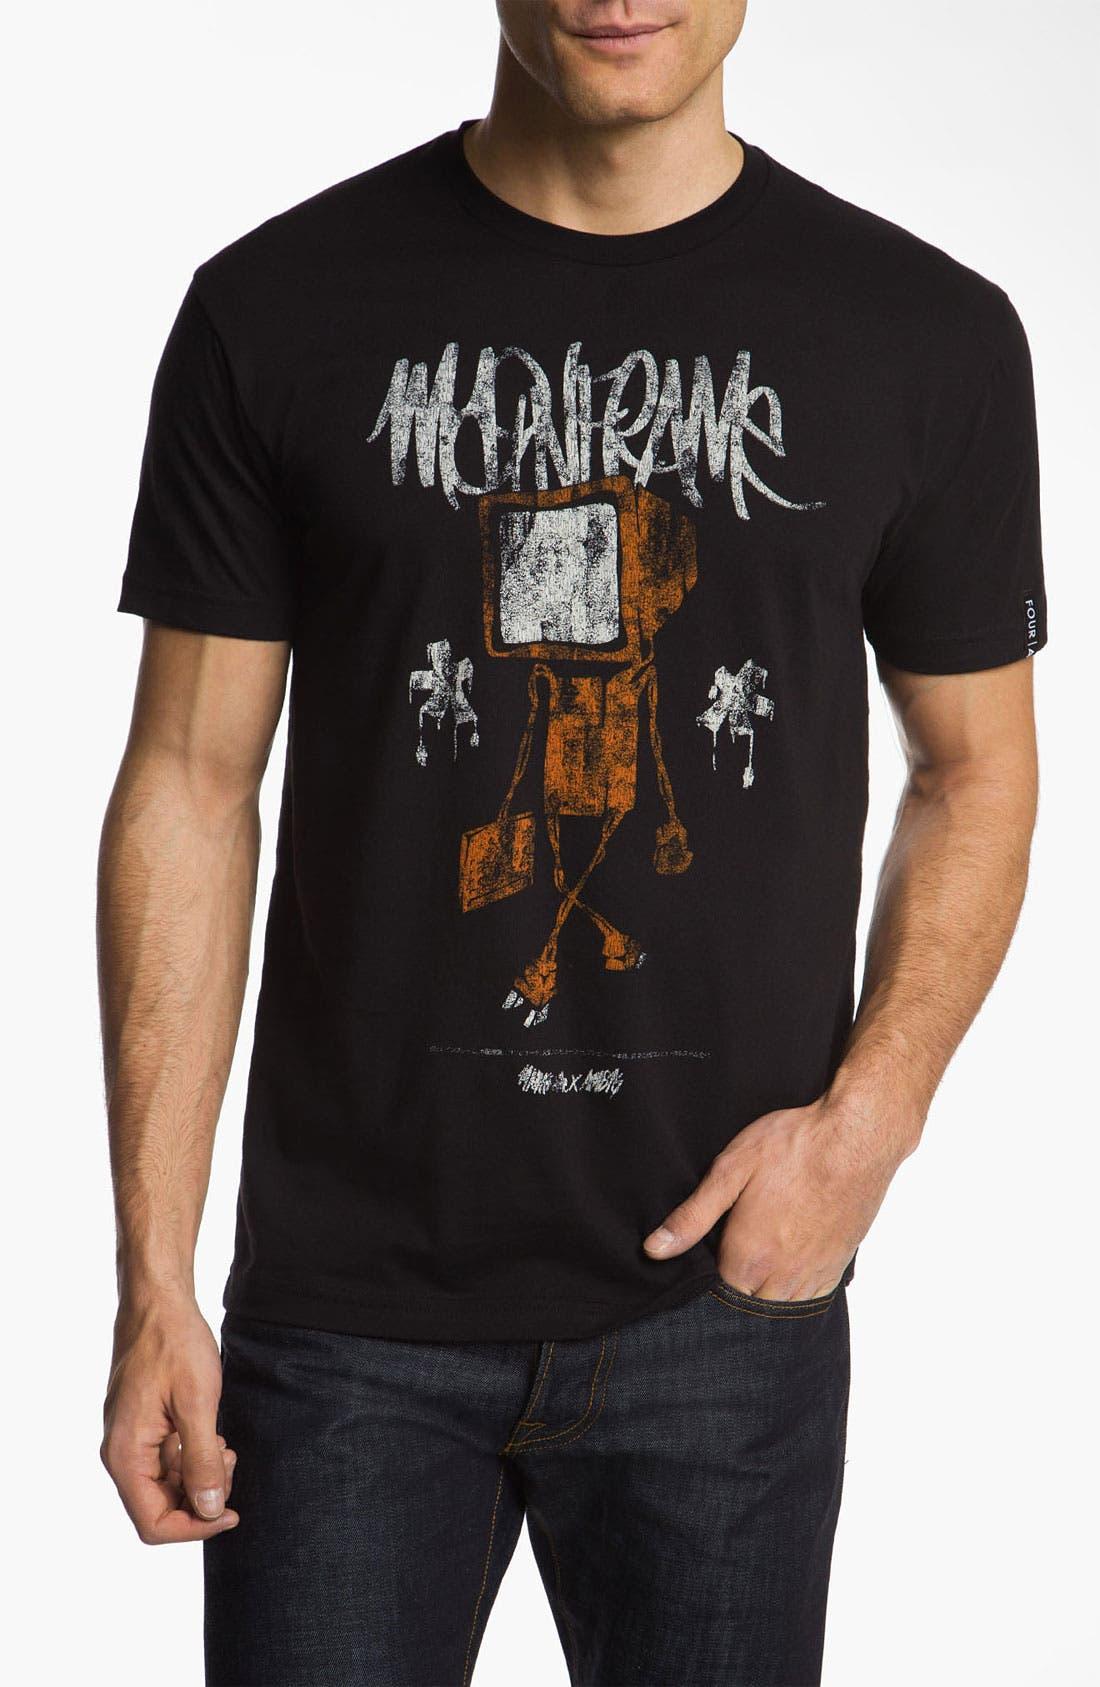 Alternate Image 1 Selected - Ambiguous 'Mainframe' T-Shirt